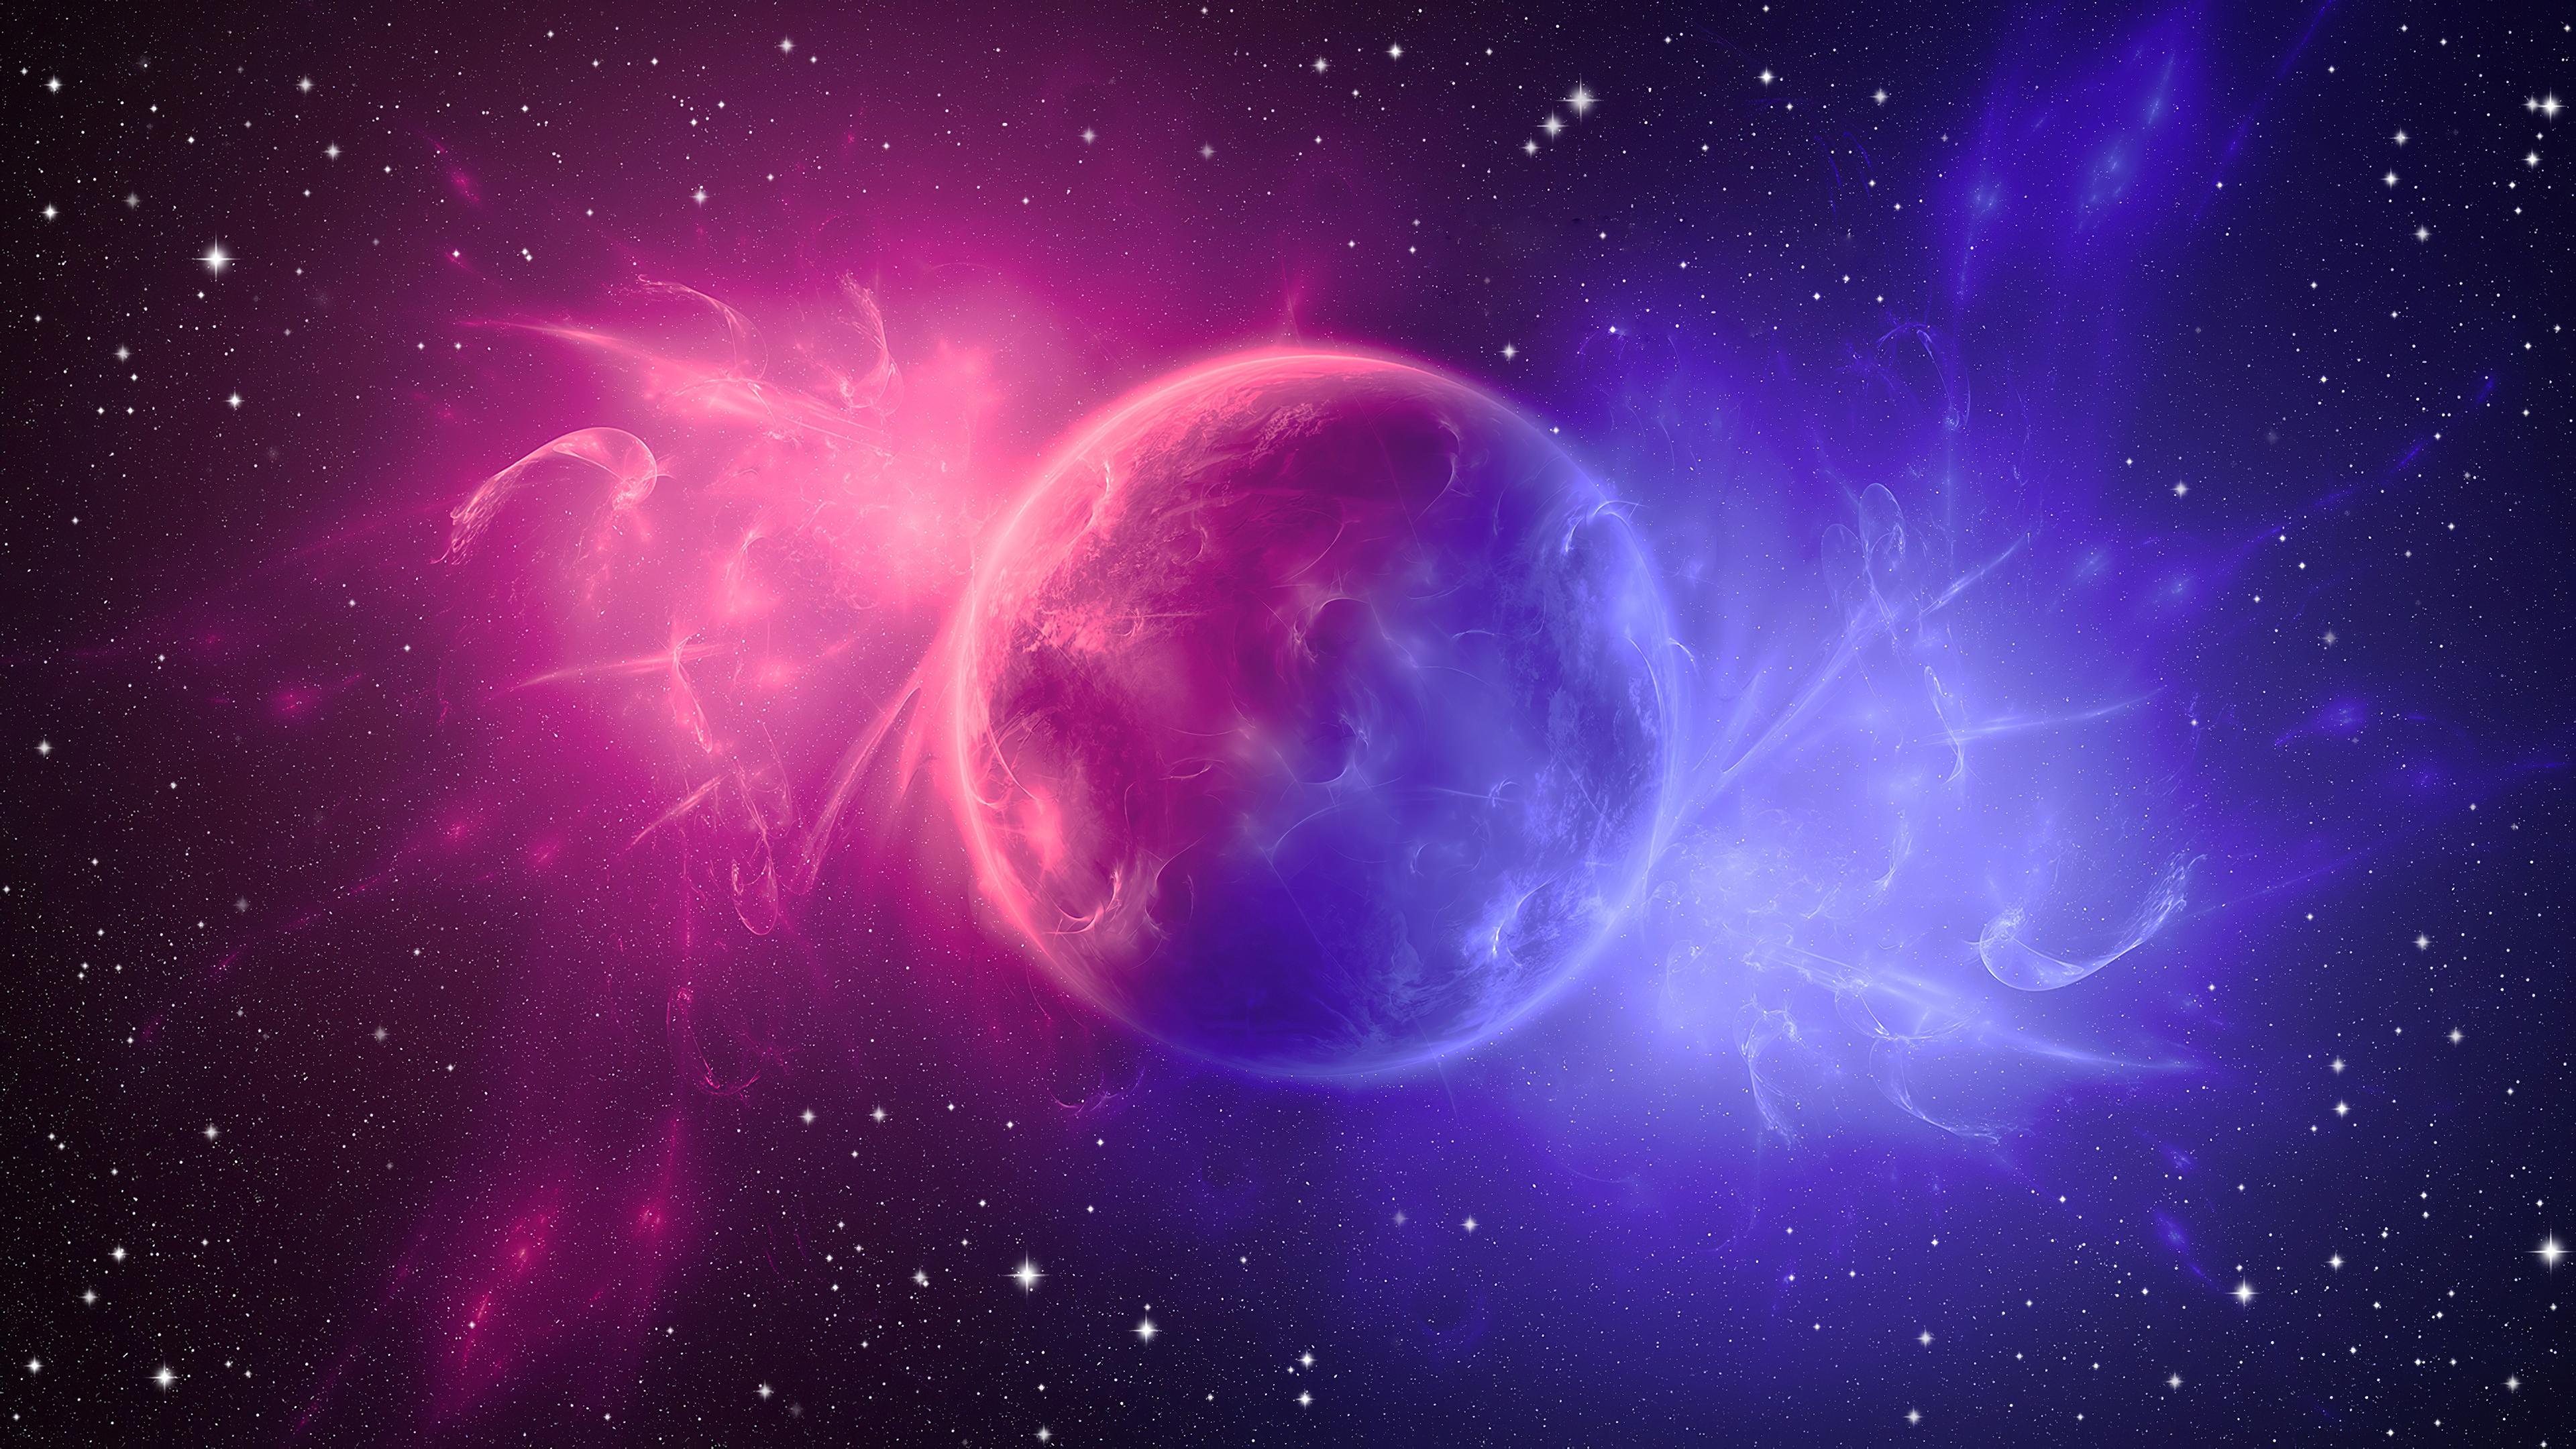 3840x2160 Space Digital Art Pink Planet 4k 4k HD 4k ...